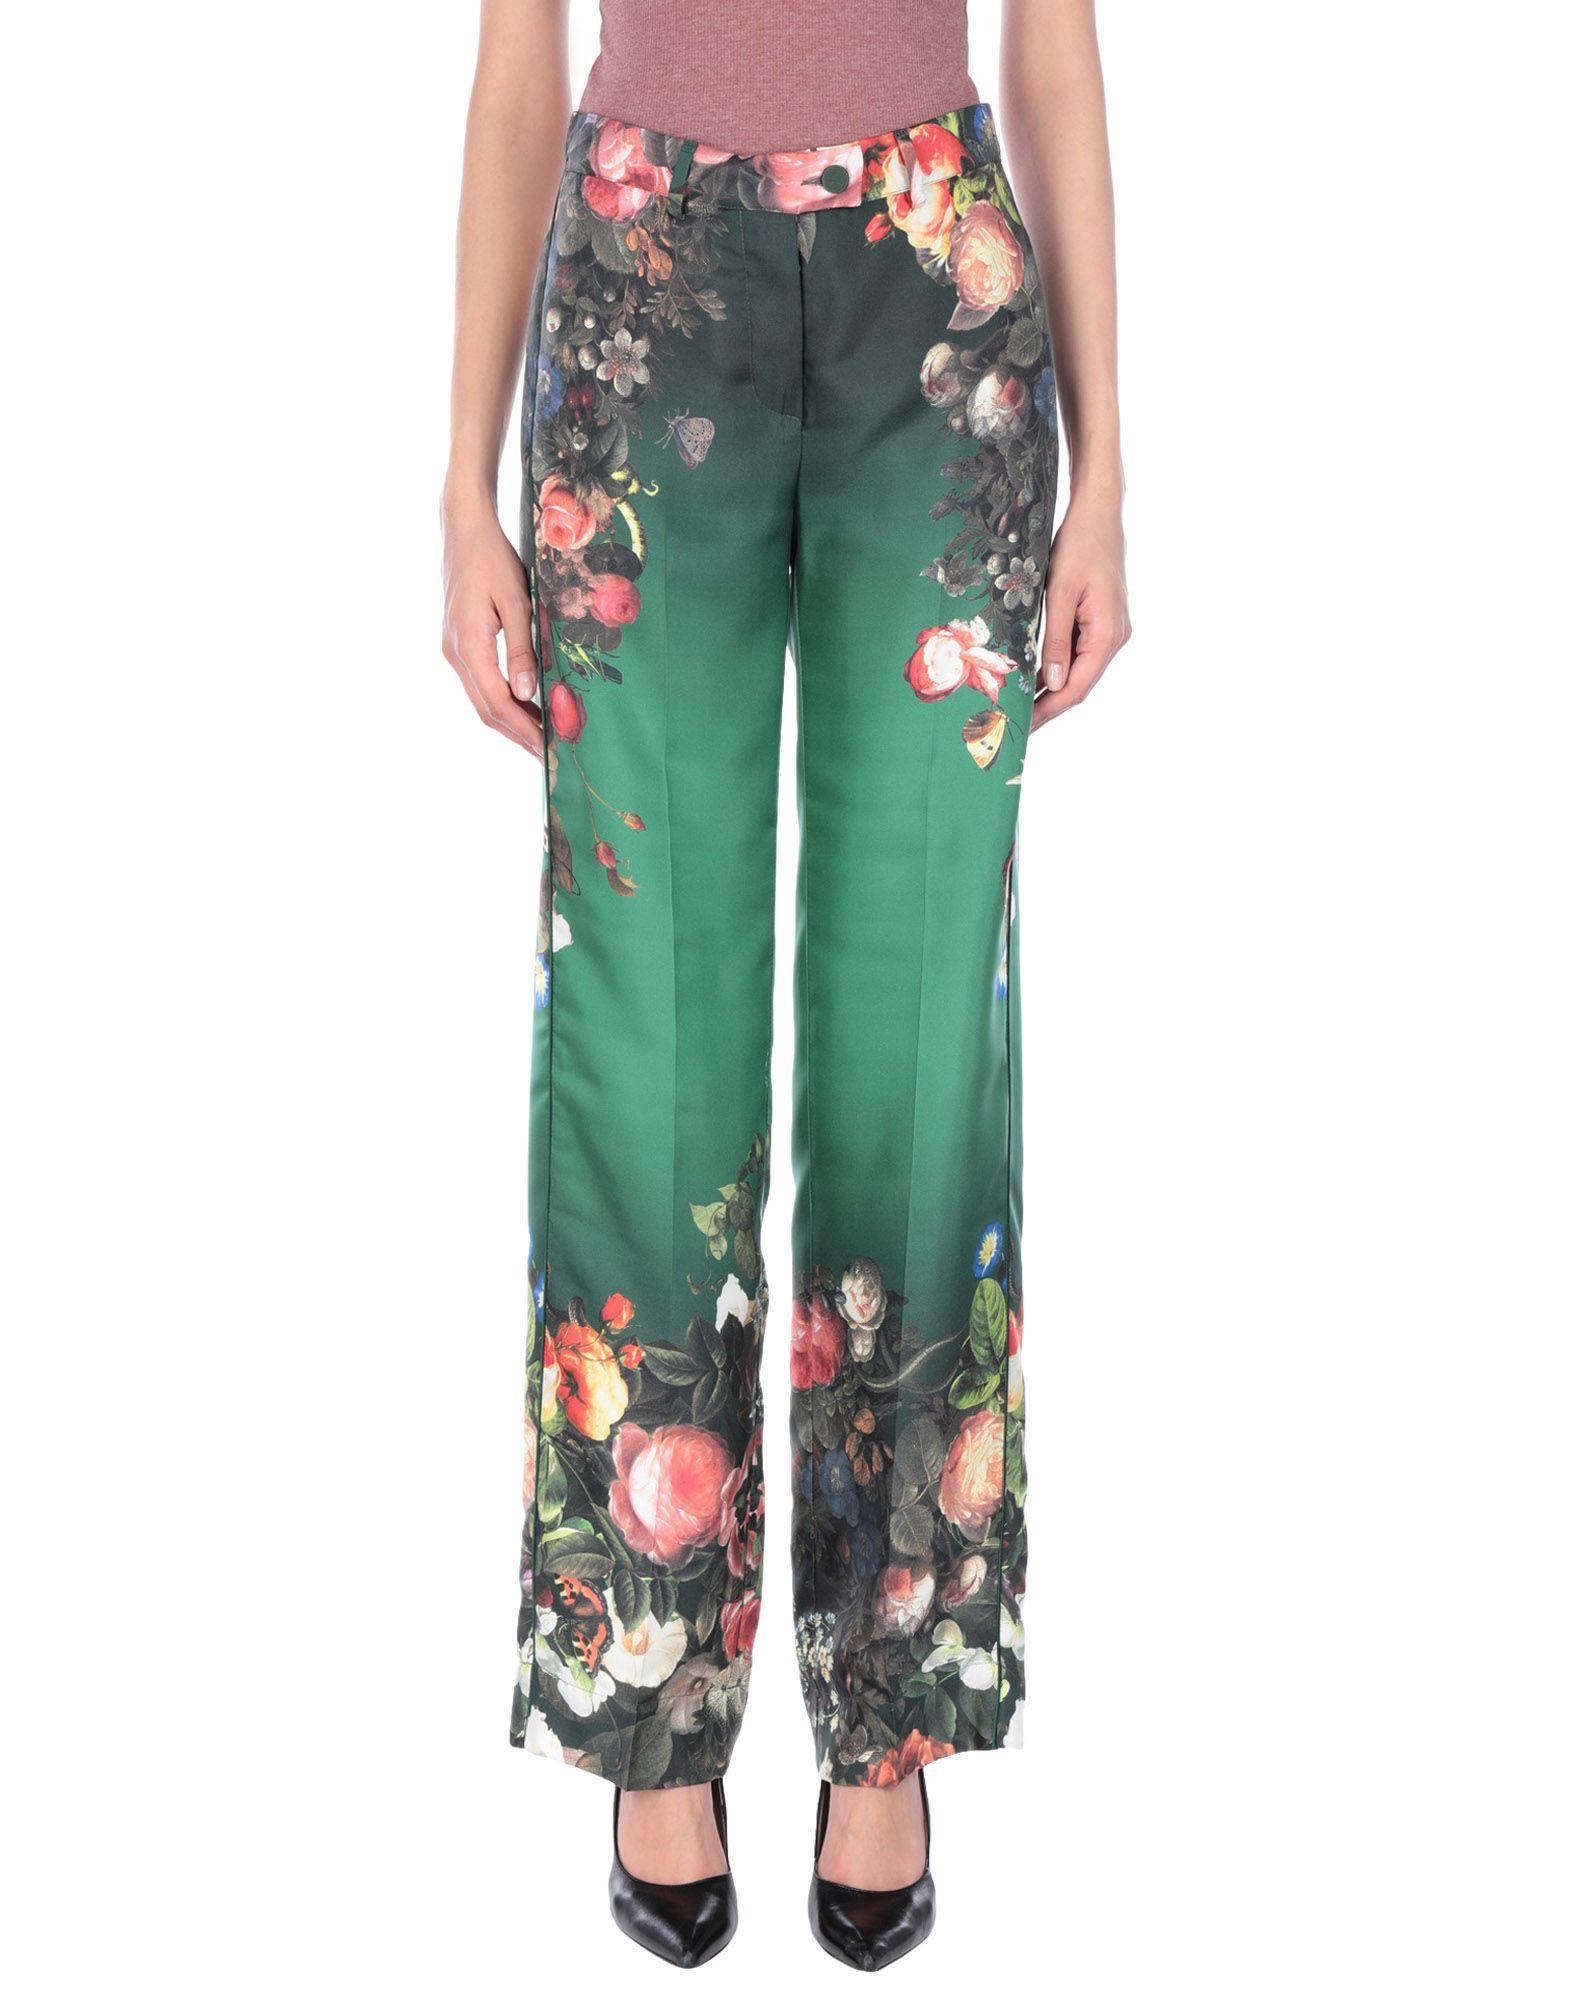 Pantalone F.R.S. F.R.S. For Restless Sleepers donna - 13315397MG  günstigster Preis